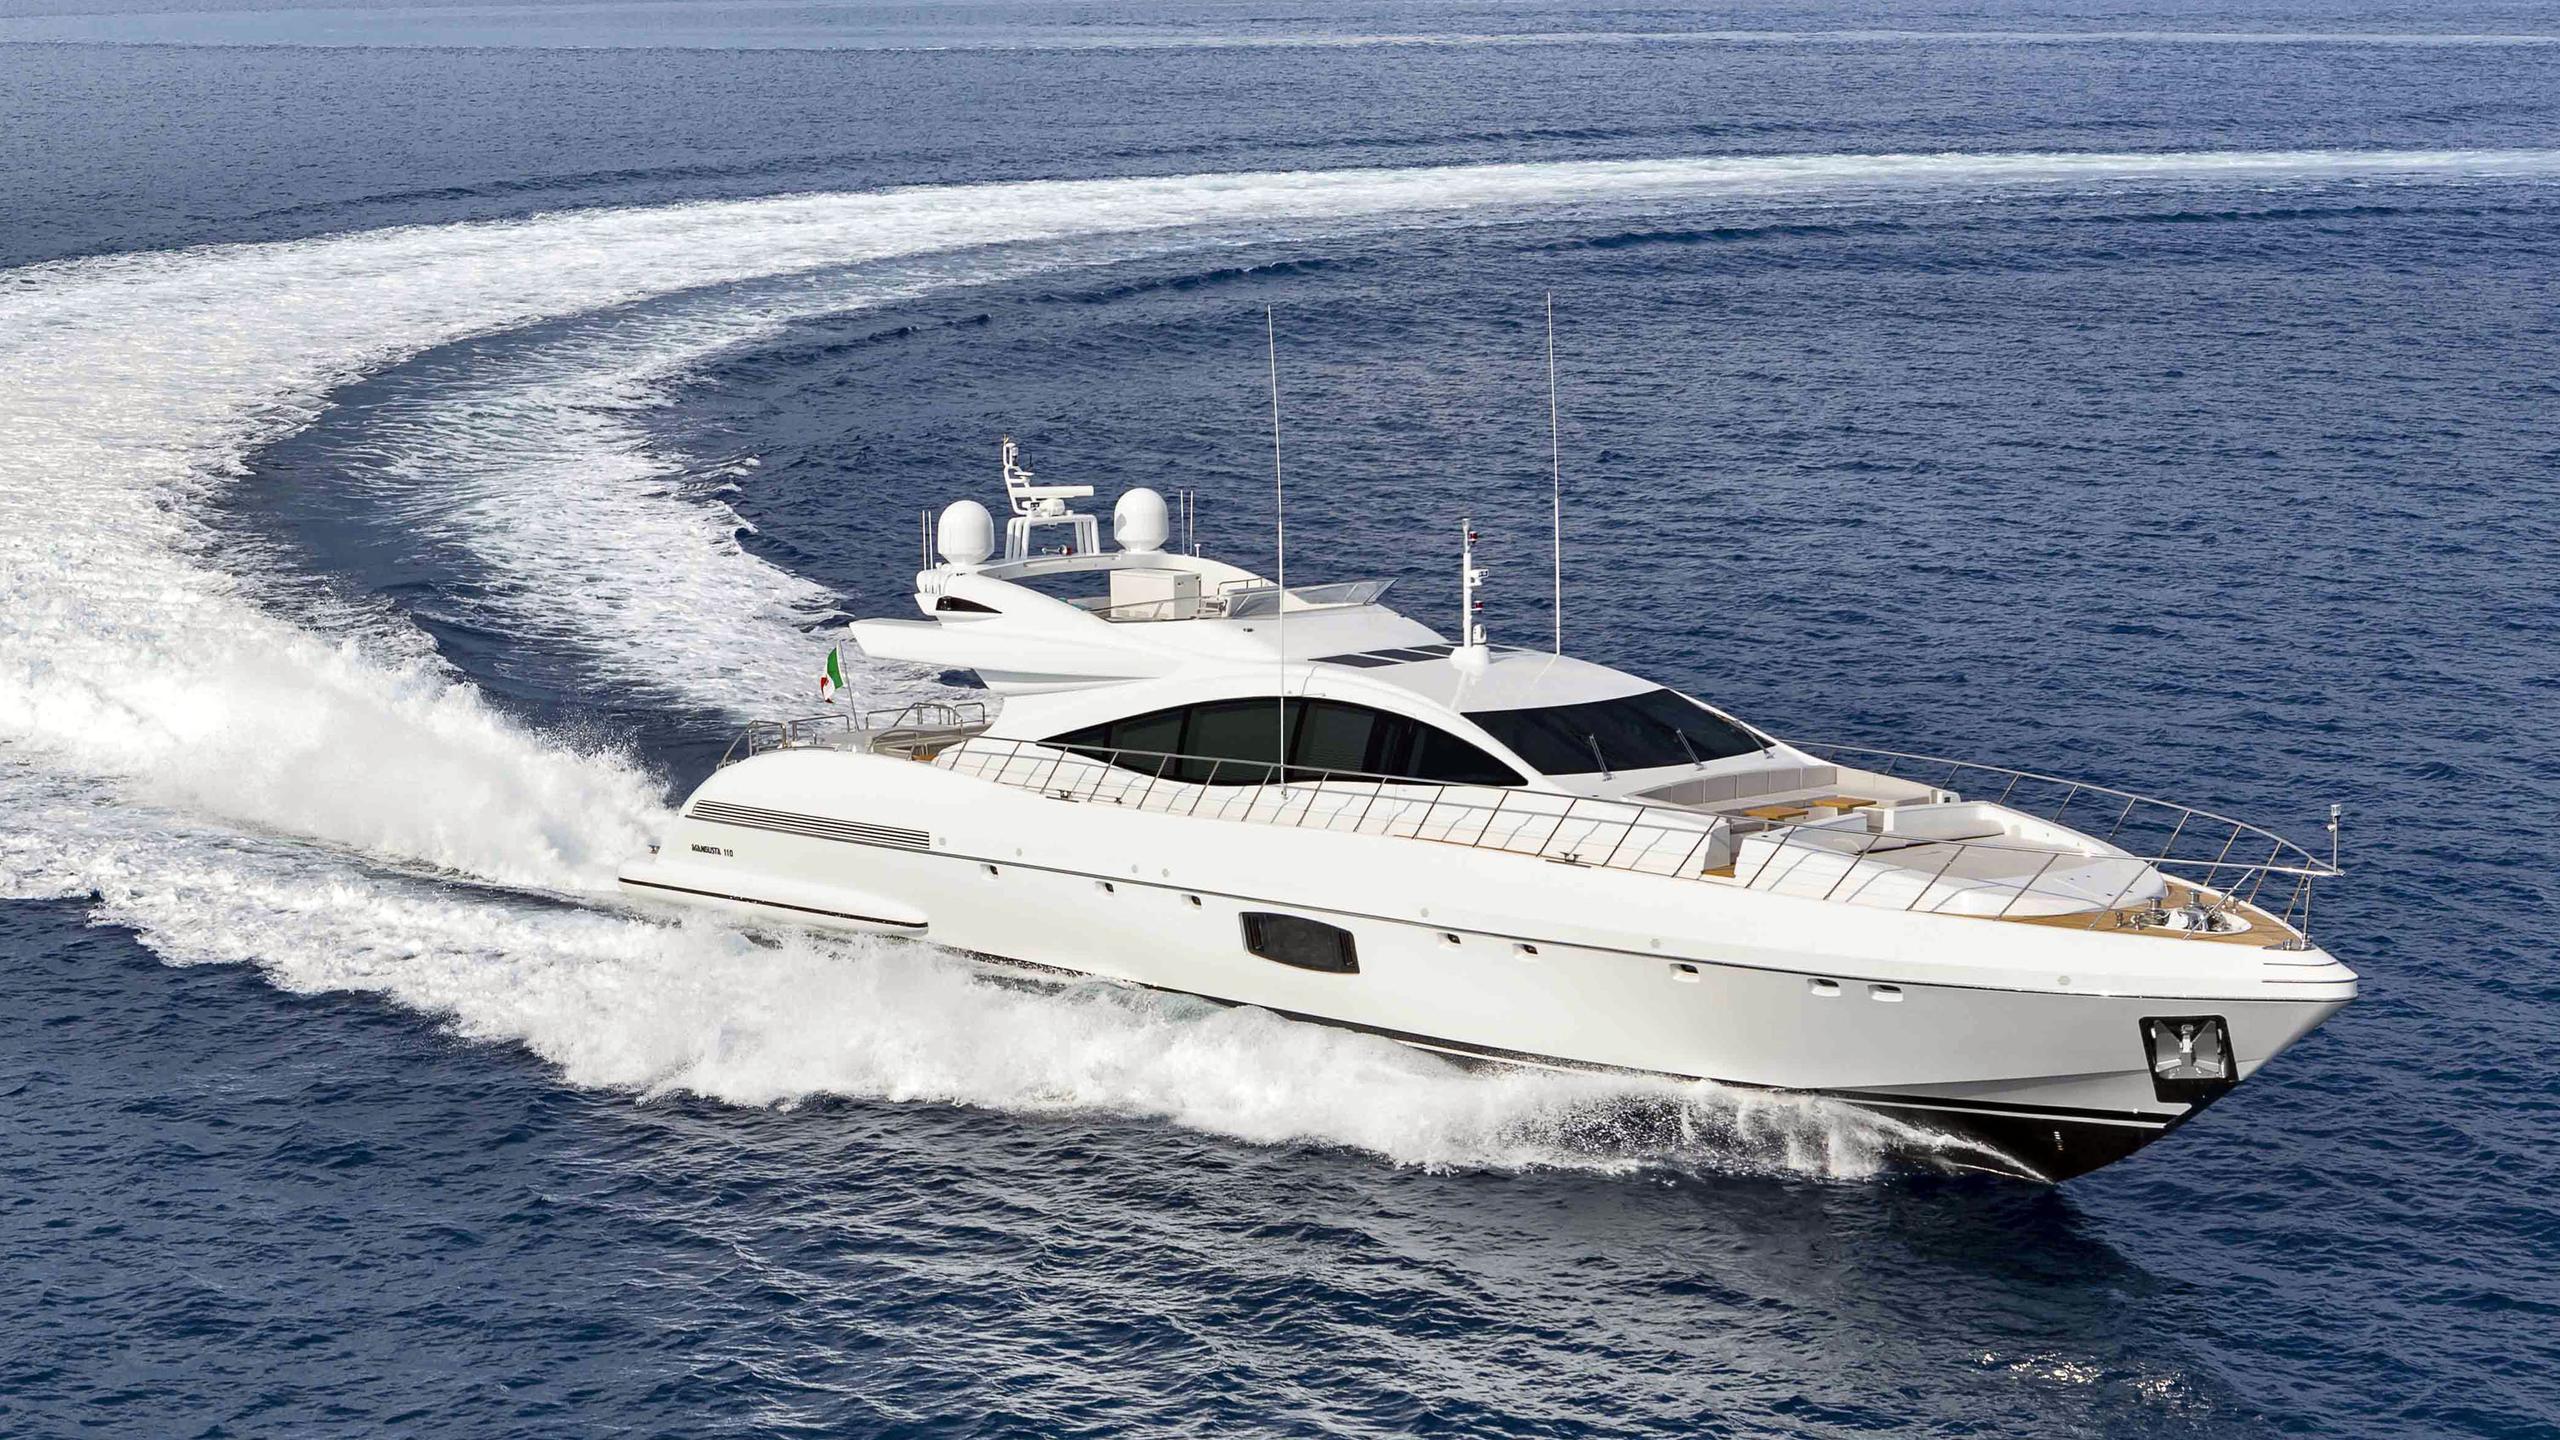 mangusta 110 motoryacht overmarine 34m 2018 half profile sistership